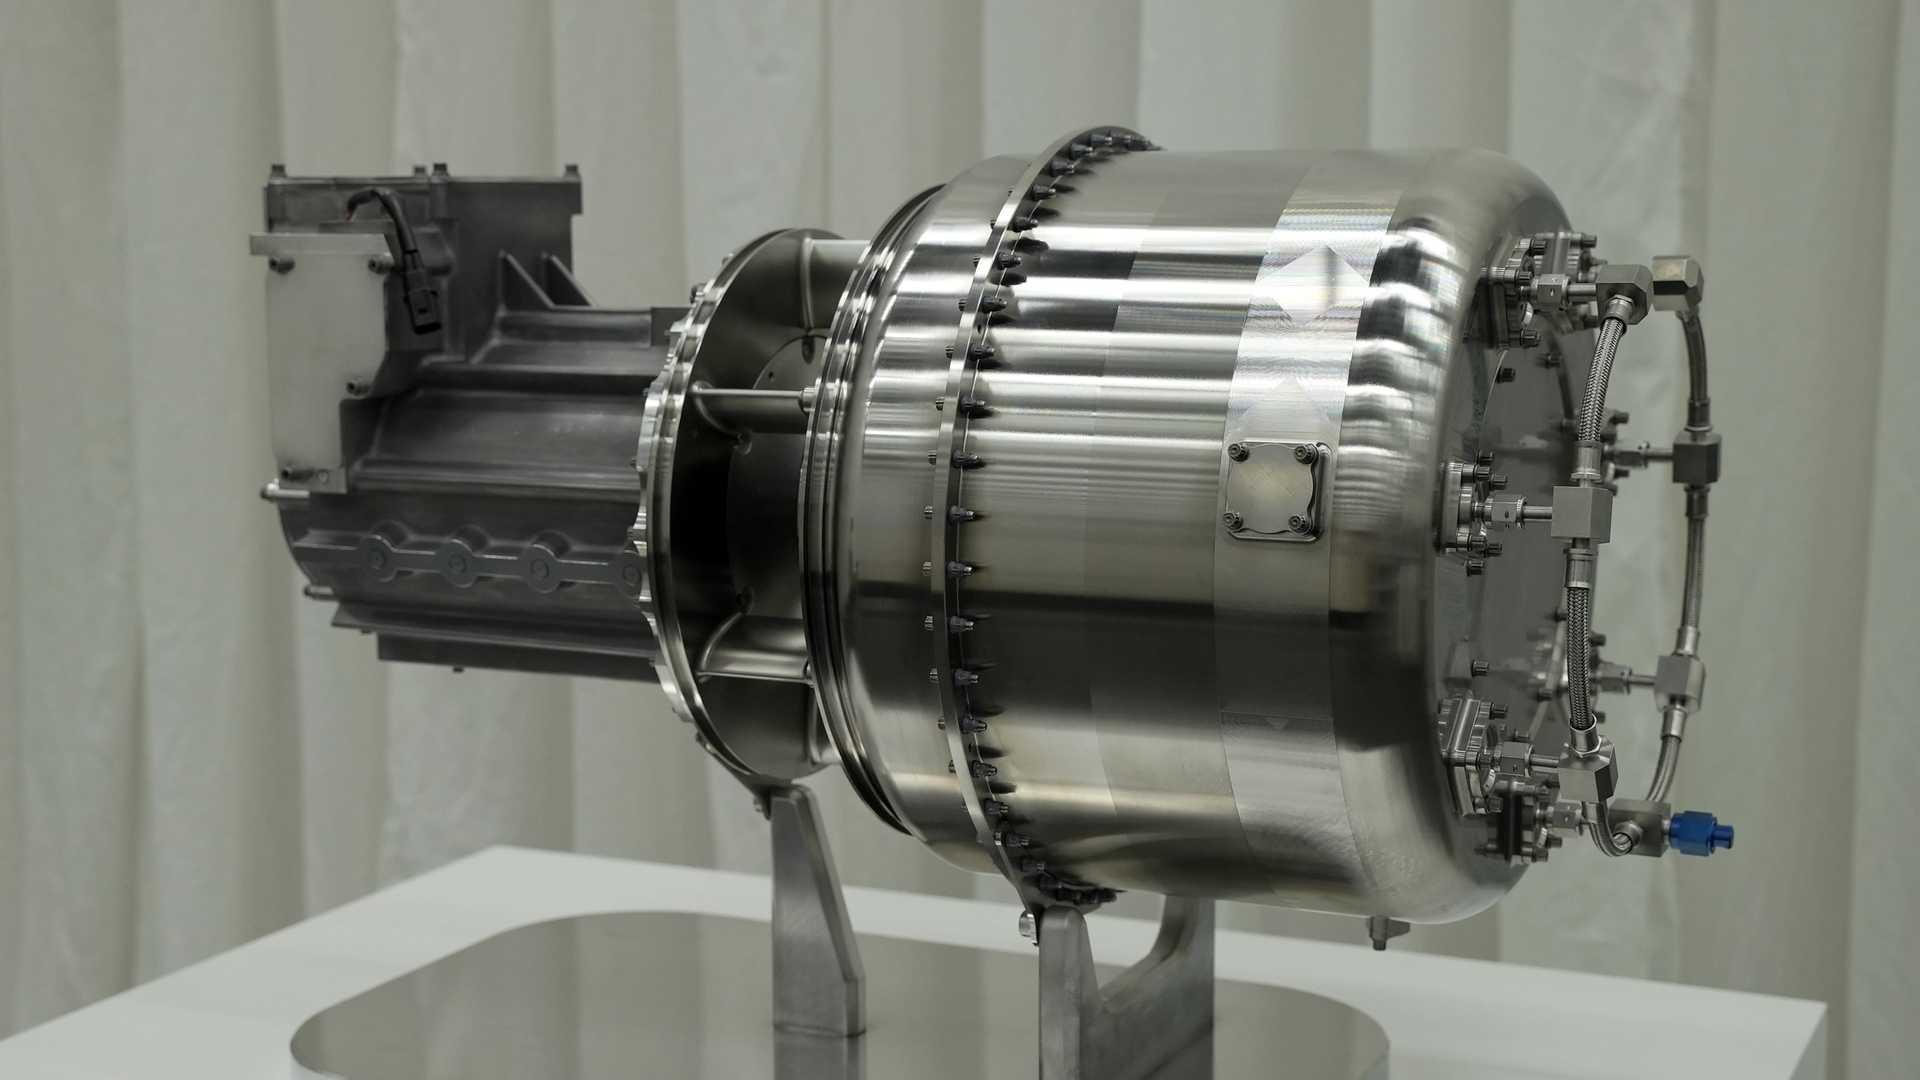 Honda-eVTOL-Hybrid-Mobility-Aircraft-9